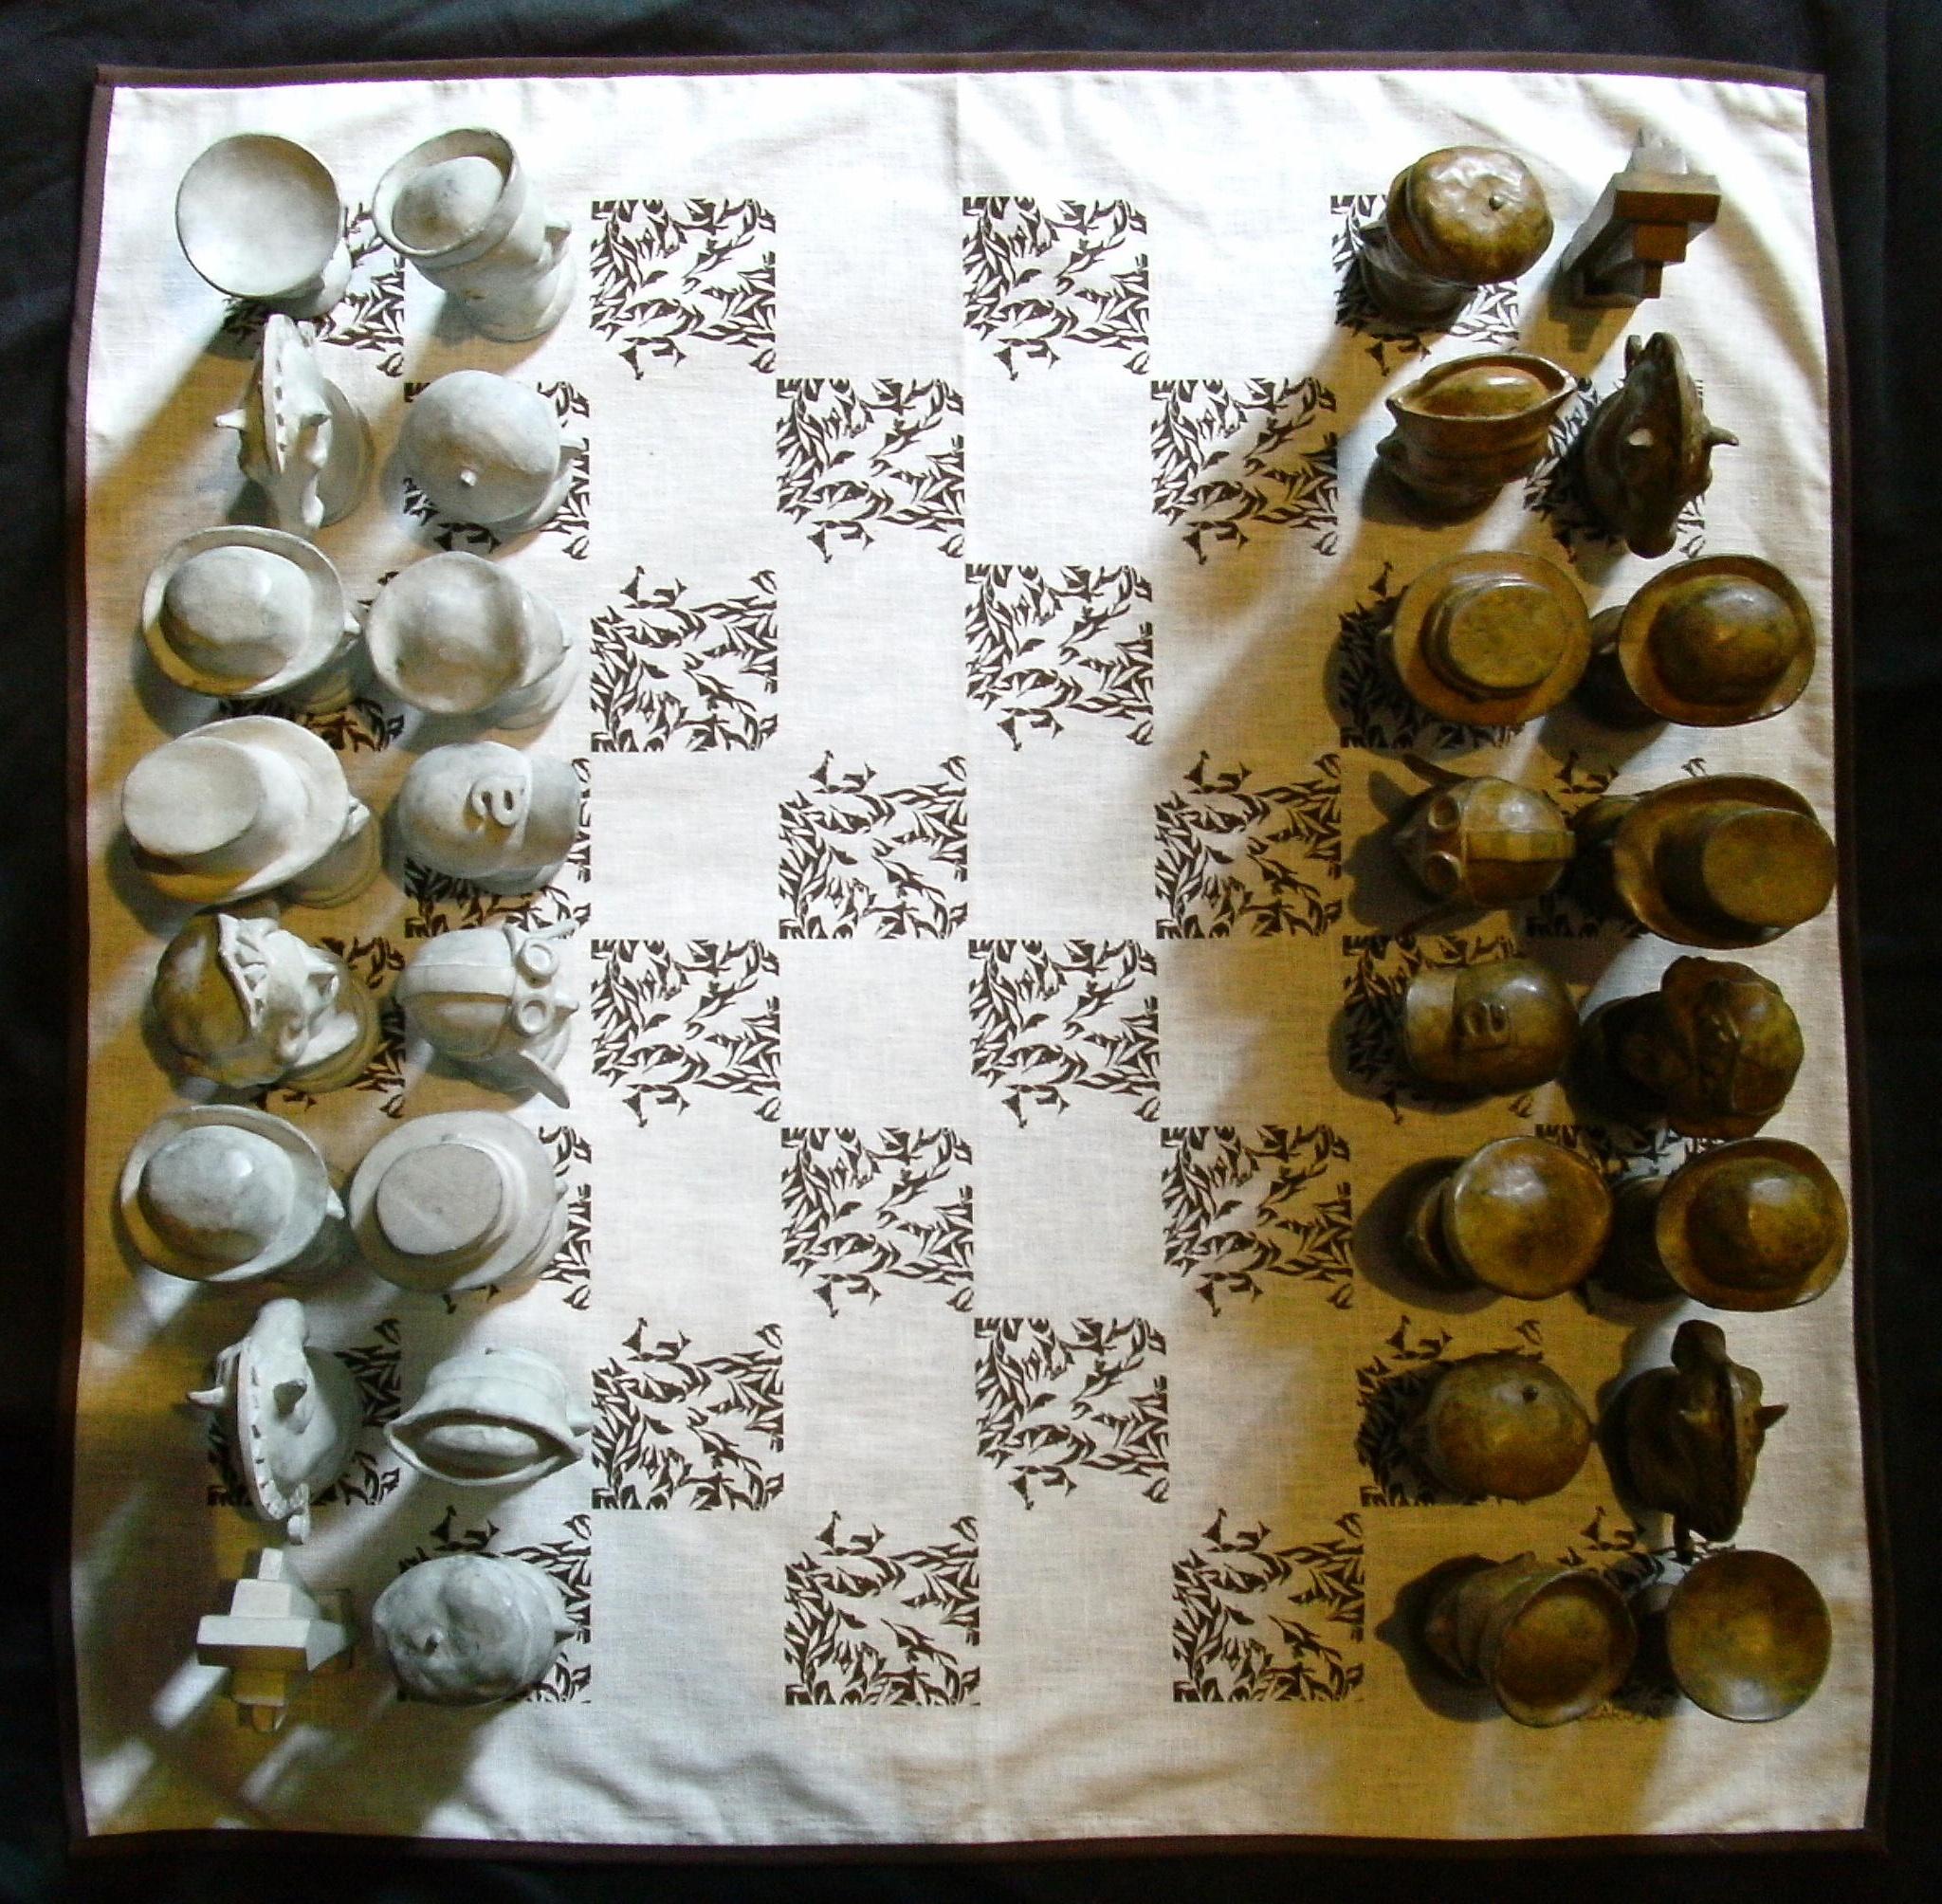 https://0201.nccdn.net/4_2/000/000/008/486/Zardoni_Alvaro_Chess_Set_03-2048x2008.jpg